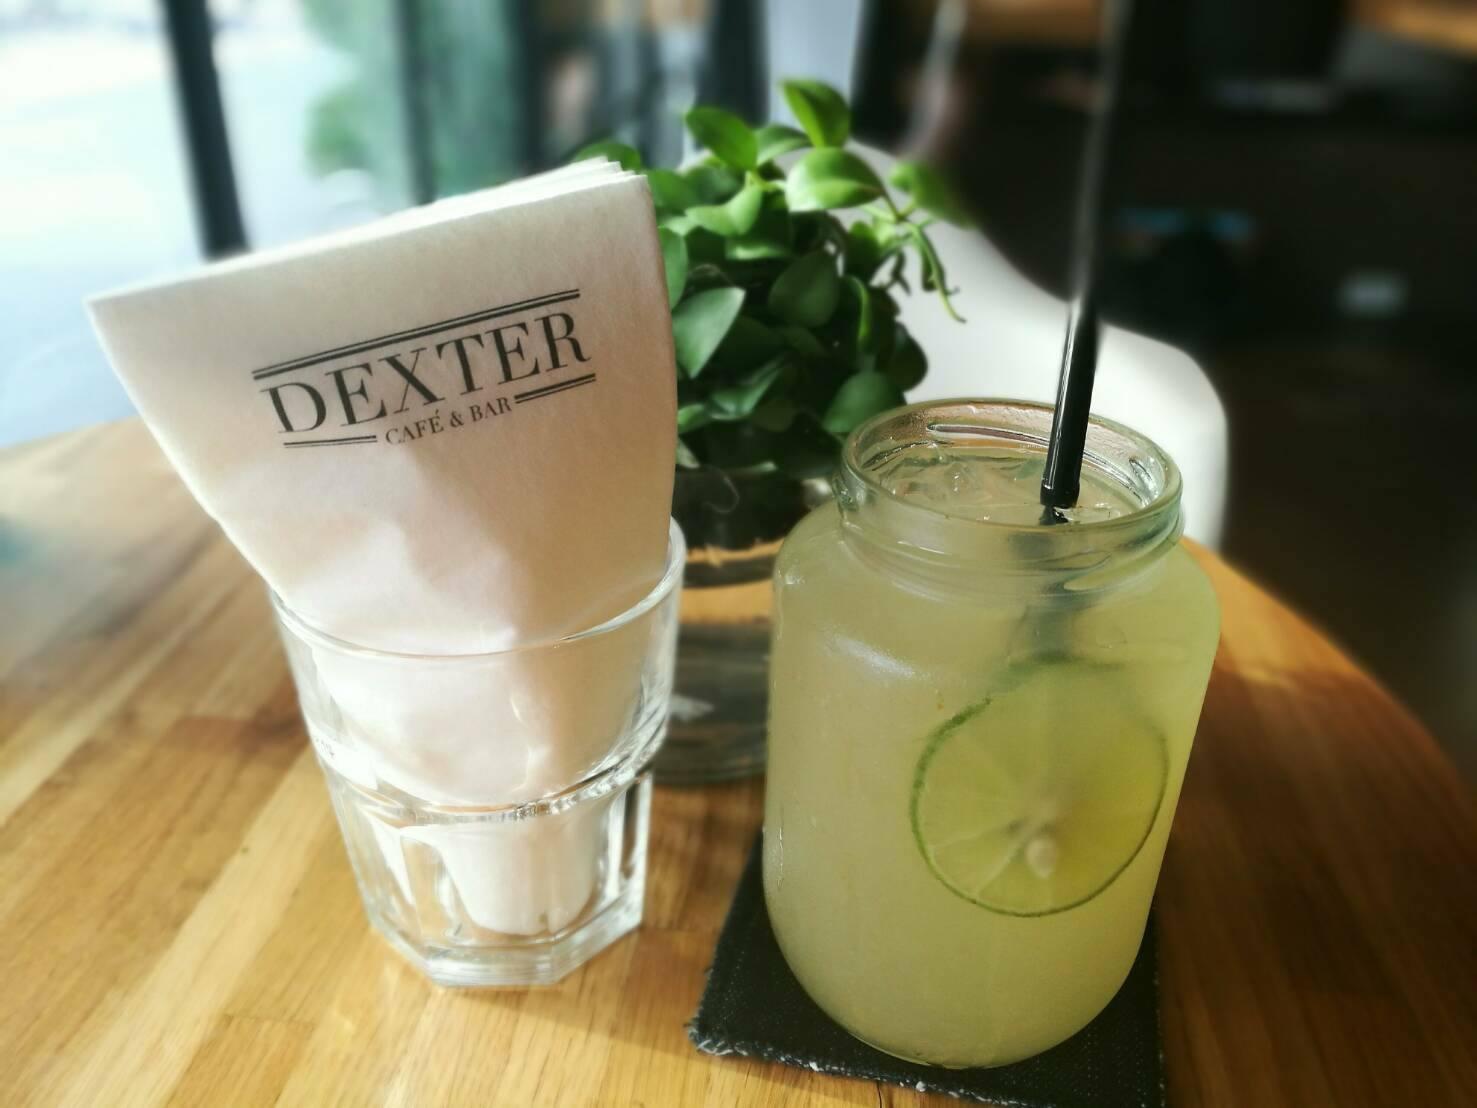 Dexter Cafe